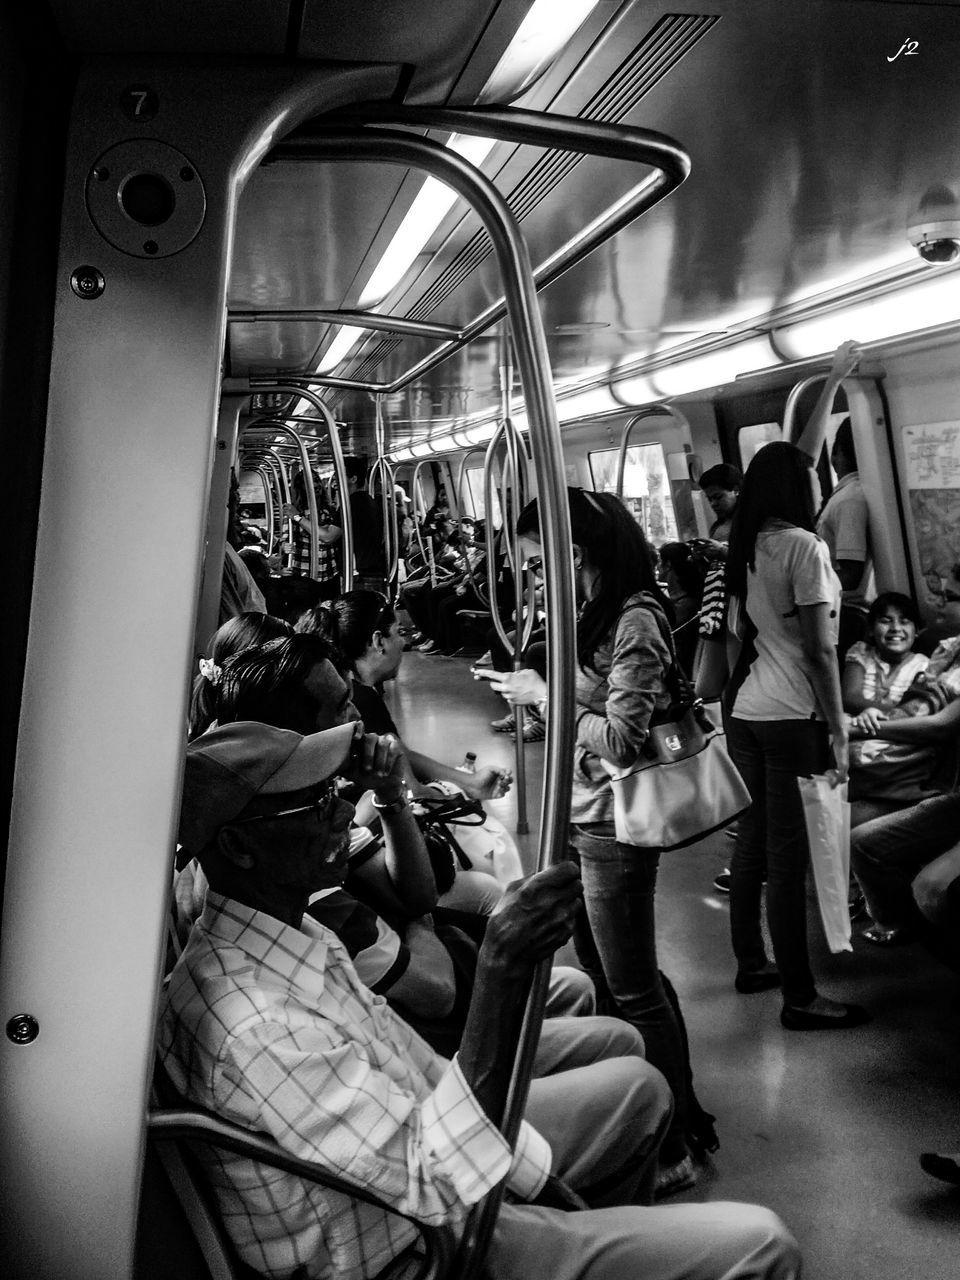 public transportation, large group of people, real people, subway train, women, transportation, men, lifestyles, illuminated, indoors, sitting, vehicle seat, commuter, night, commuter train, adult, people